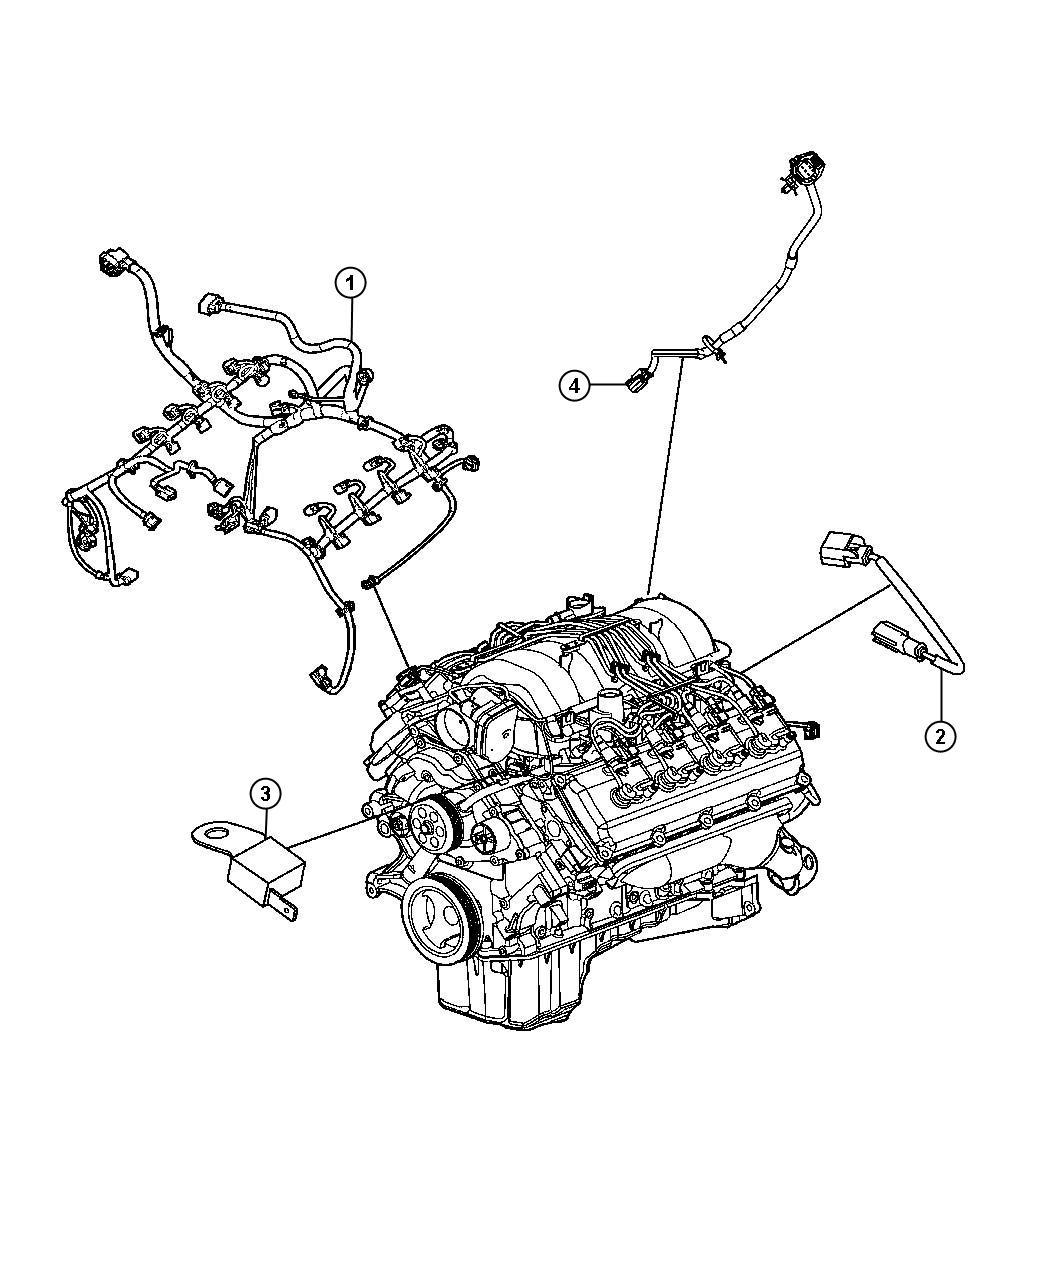 Dodge Challenger 5 7l V8 Hemi Mds Vvt 5 Speed Auto